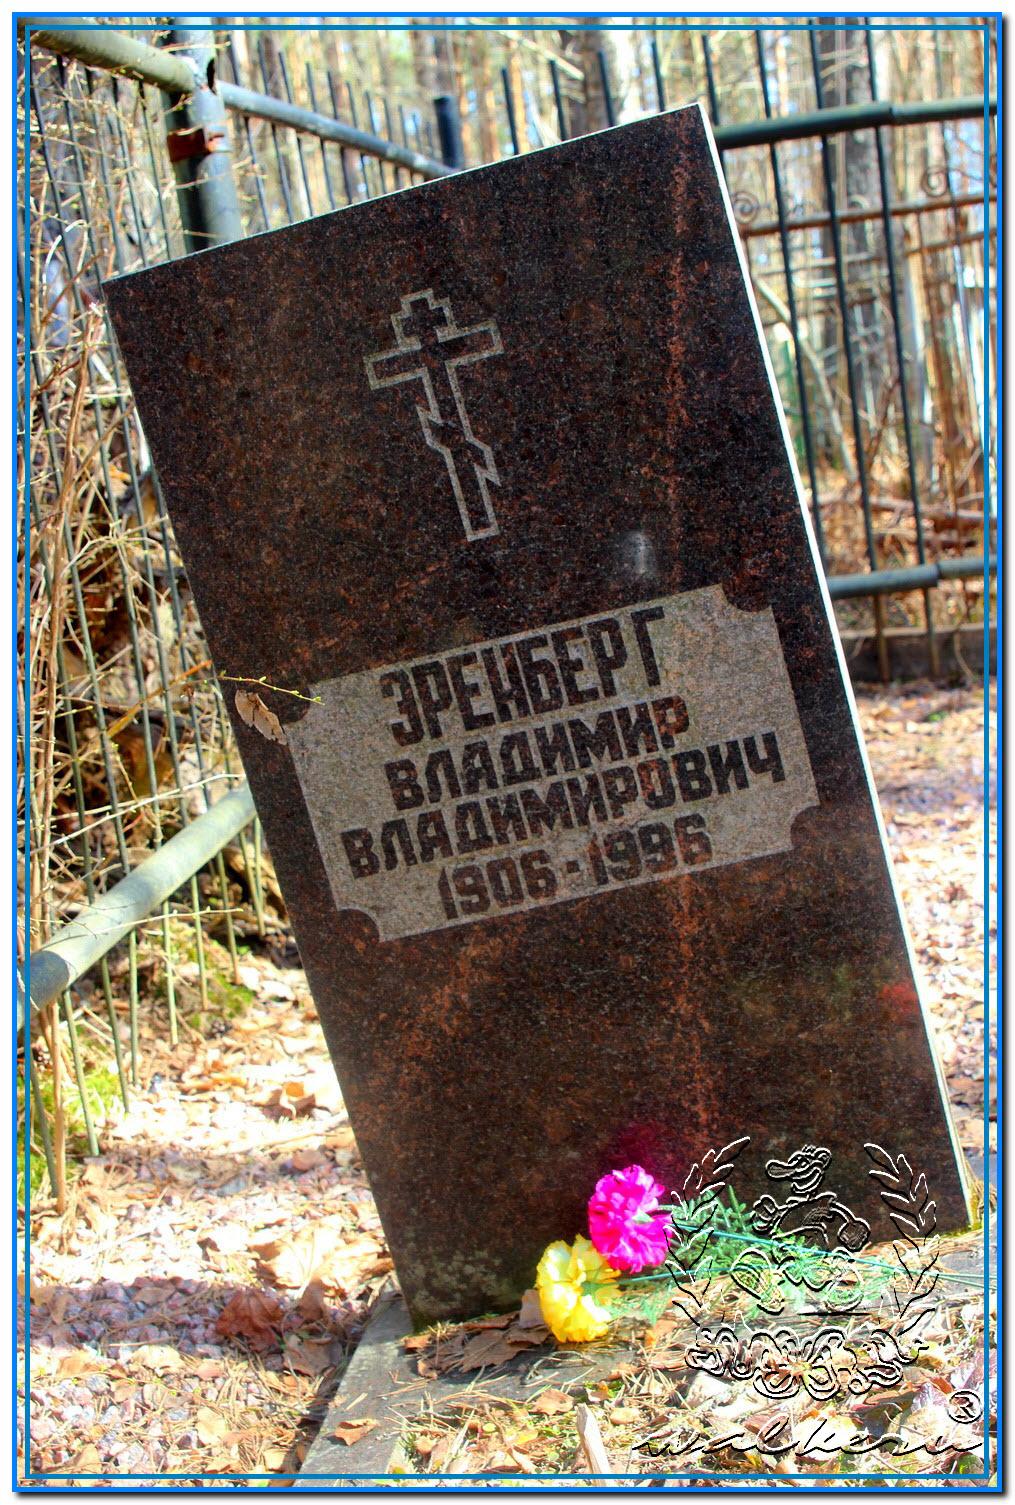 Эренберг Владимир Владимирович